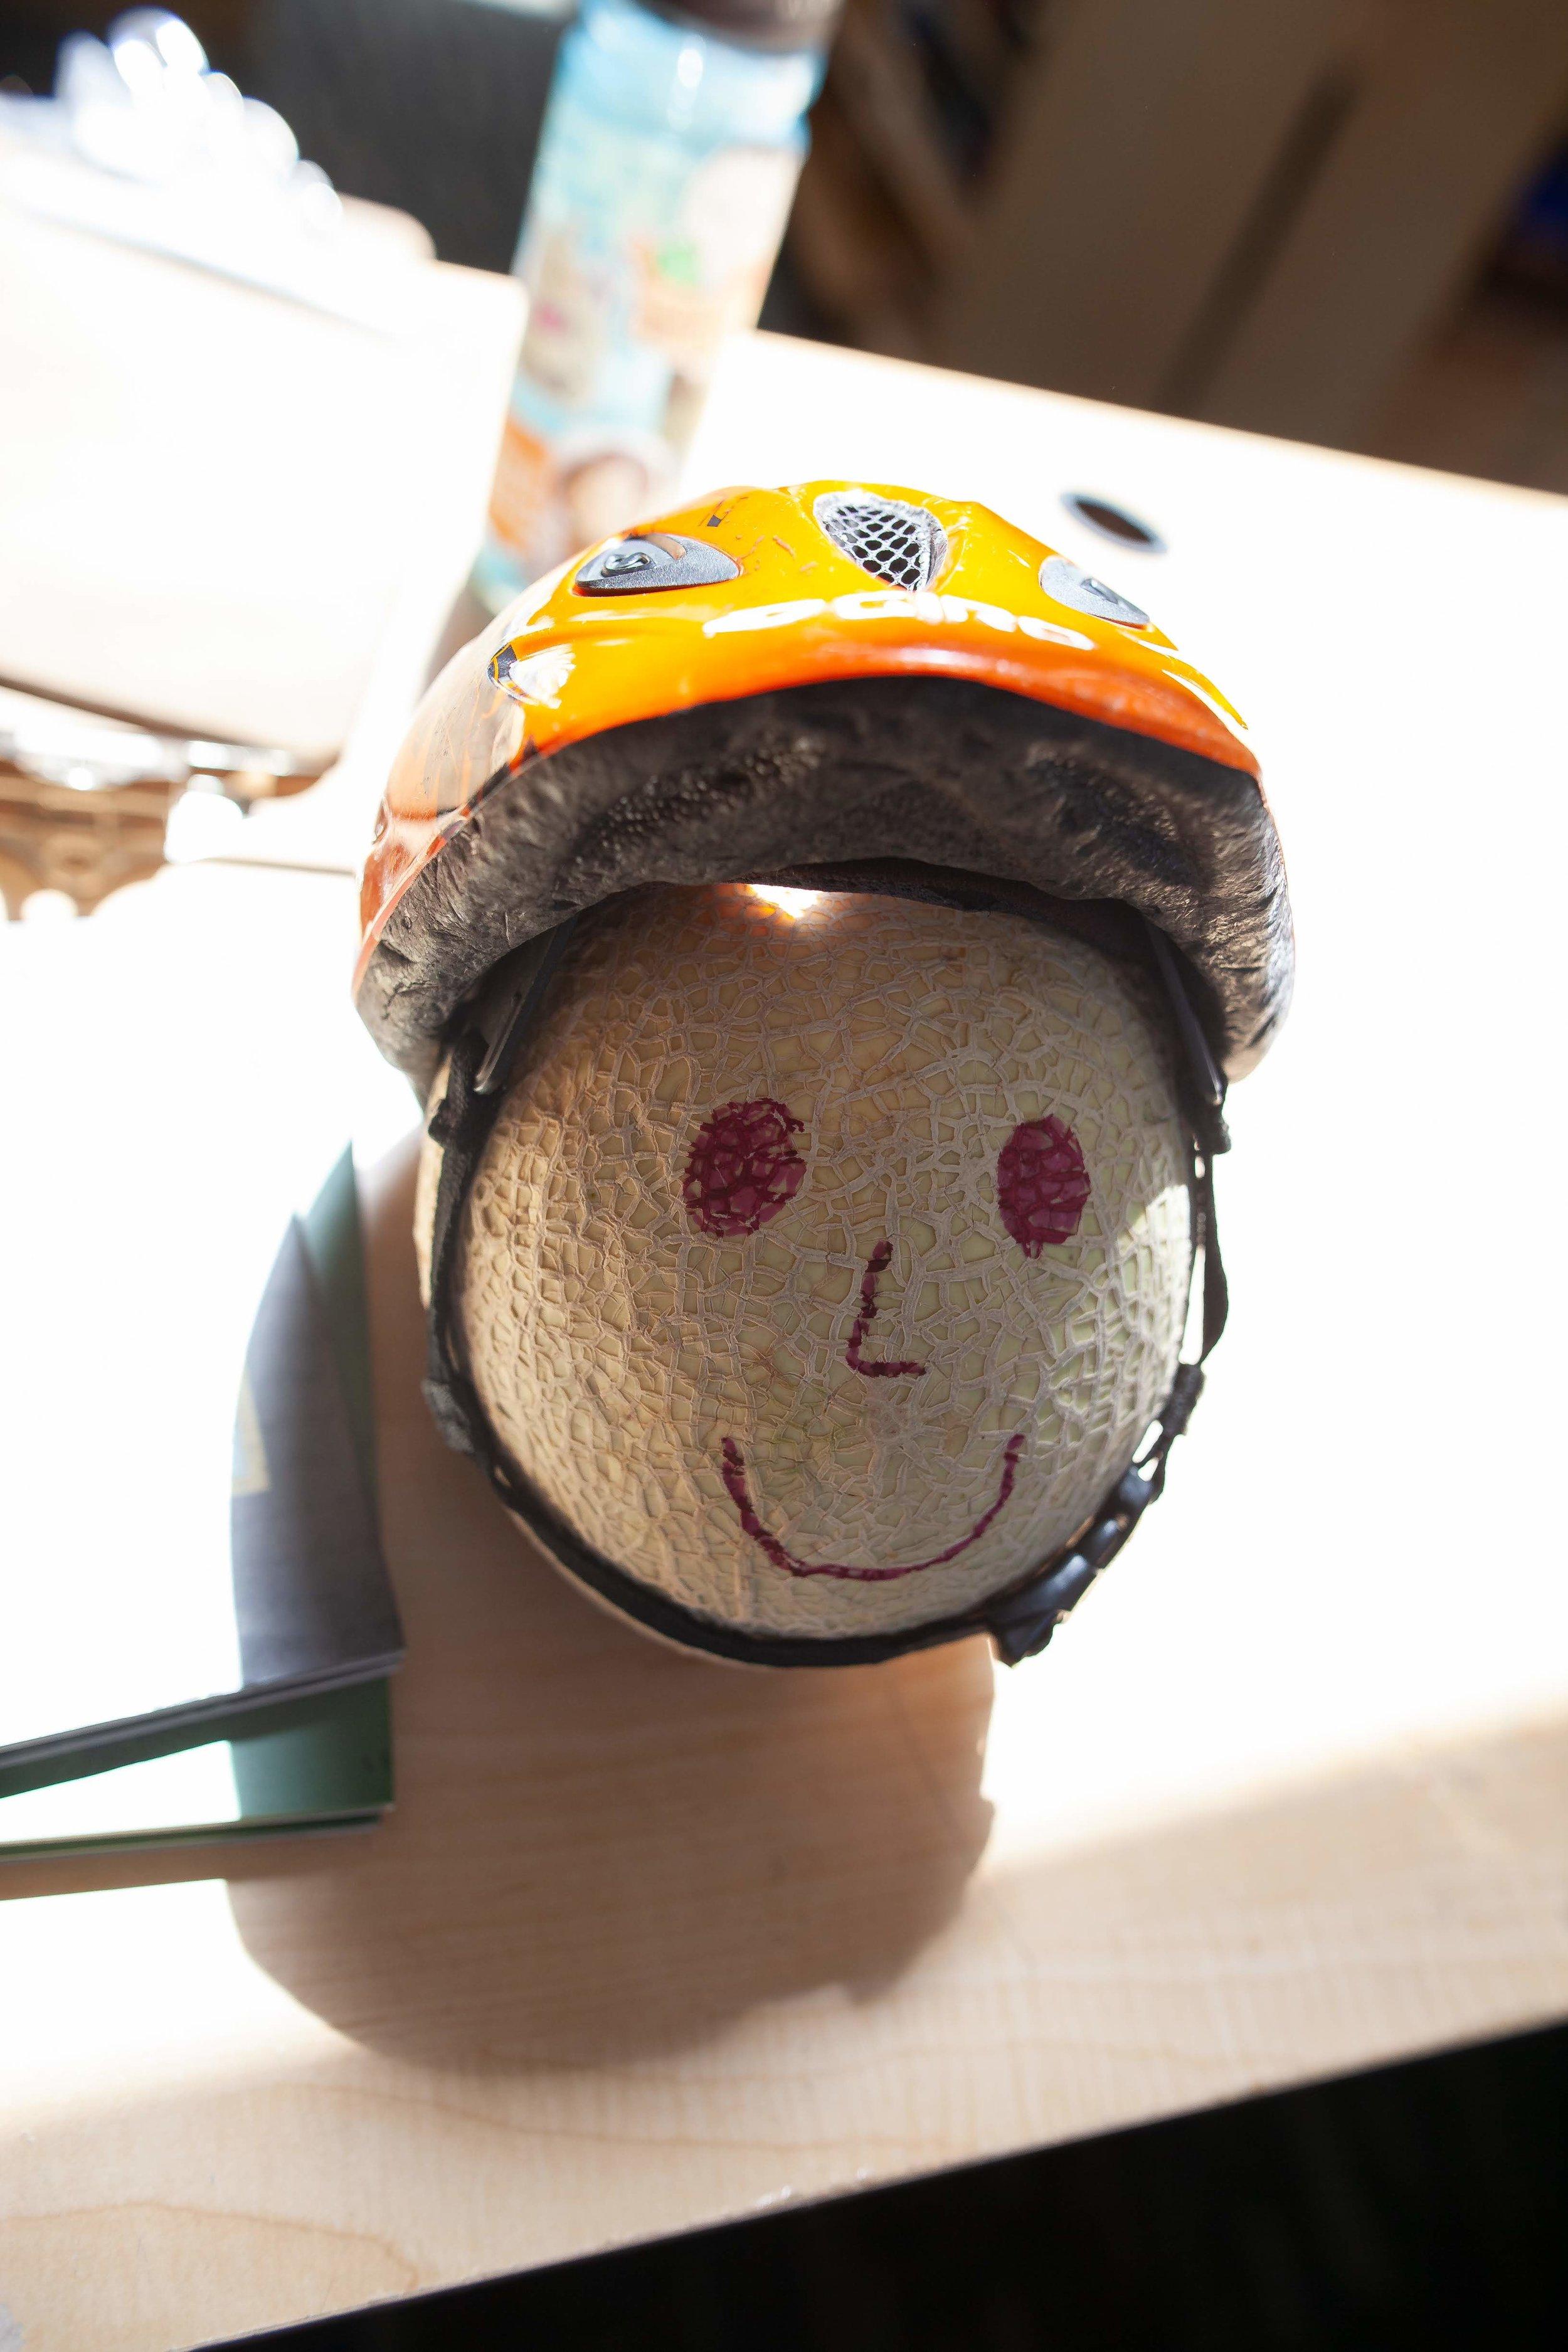 UE Helmet Safety.jpg